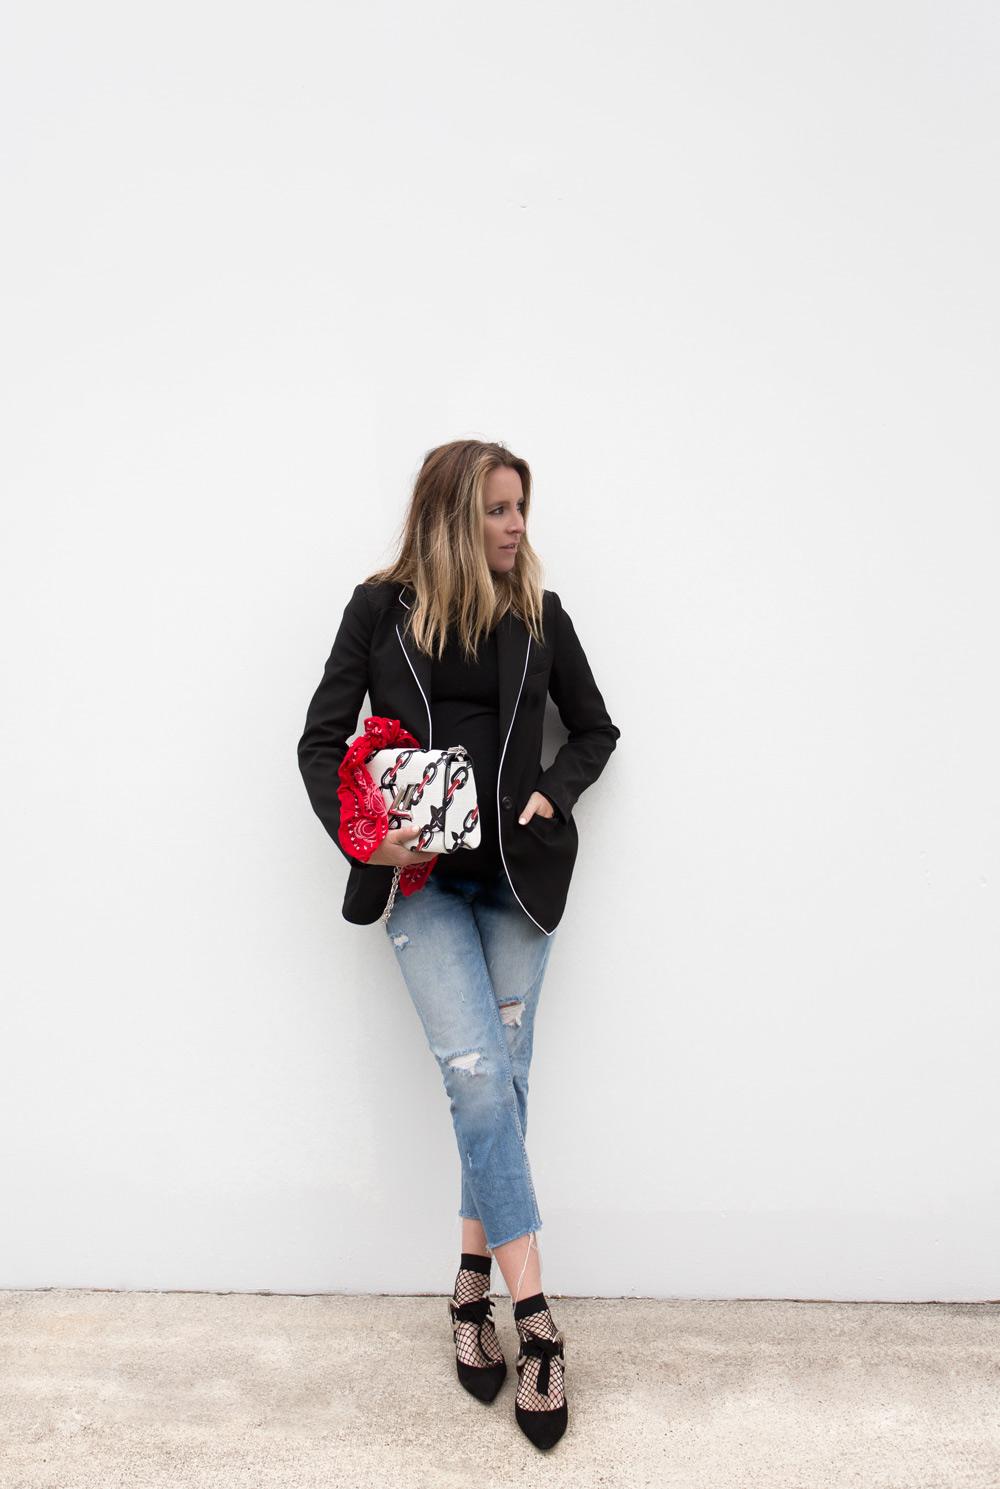 Proenza Schouler shoes, Proenza Schouler, mirror heels, louis vuitton bag, bandana, jeans, street style, amanda shadforth, oracle fox